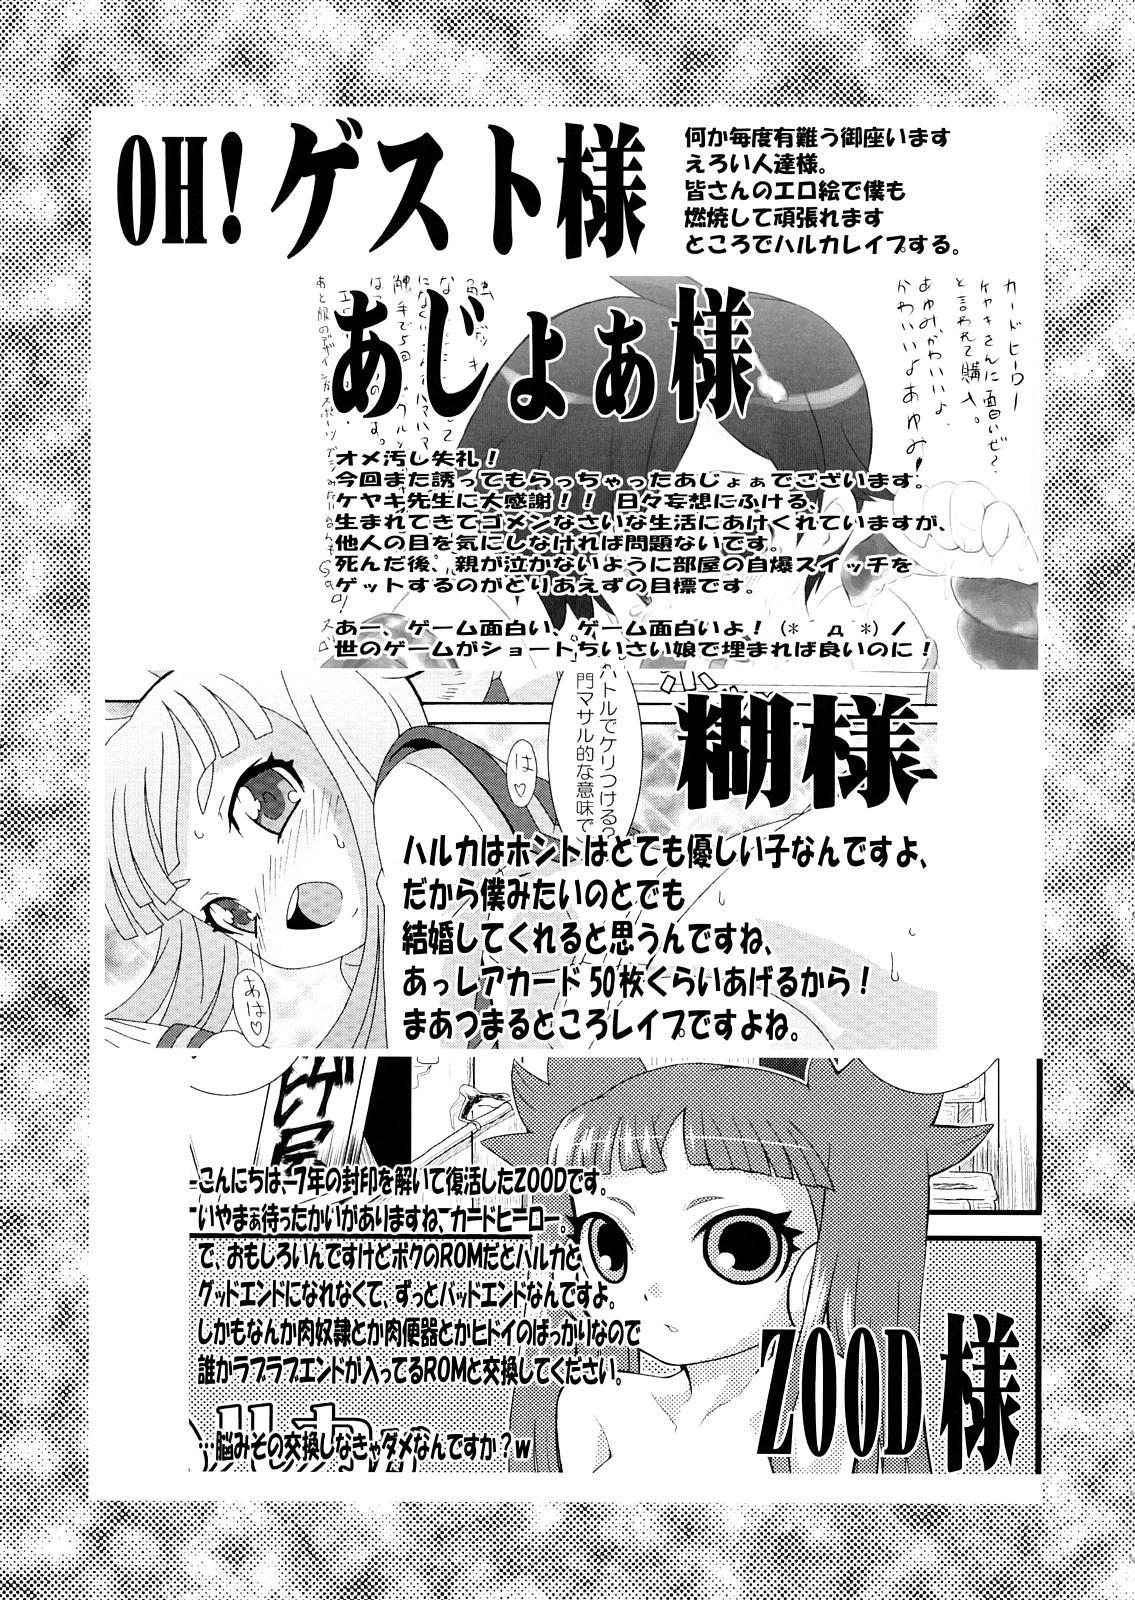 DS tte Omoshiroi Game ga Ookute Suteki 31